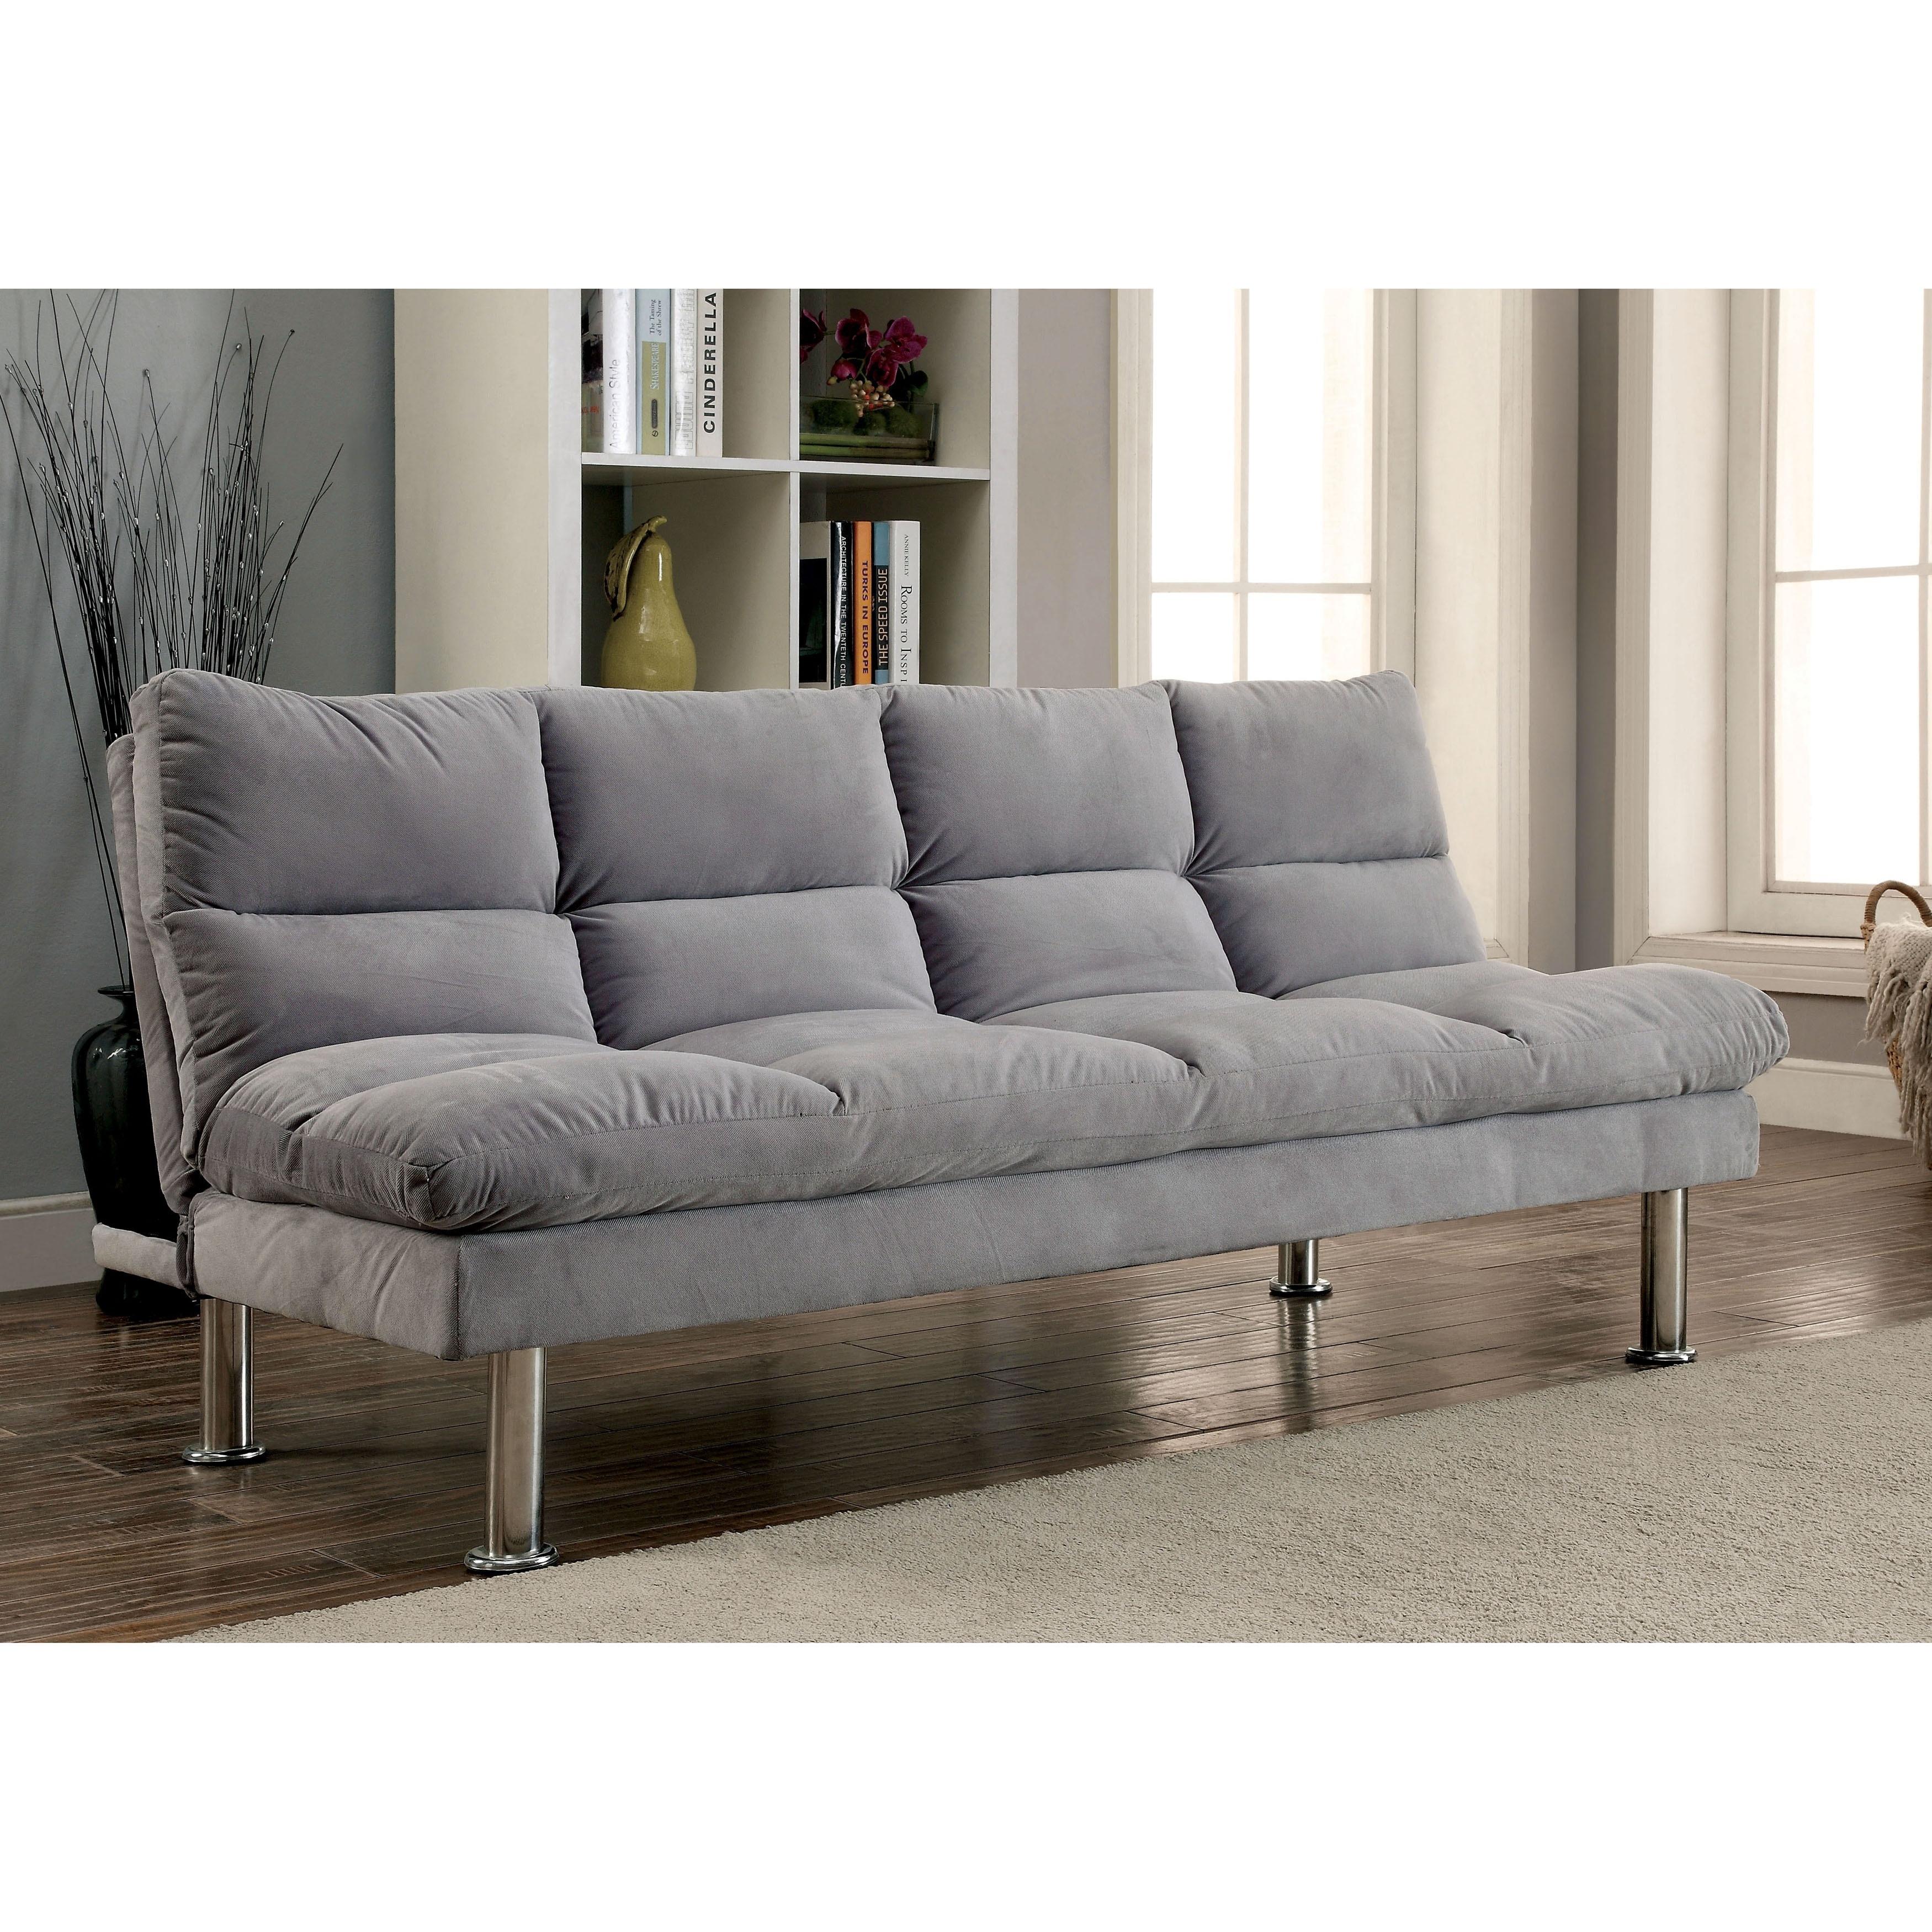 Furniture of america willow microfiber sofa futon